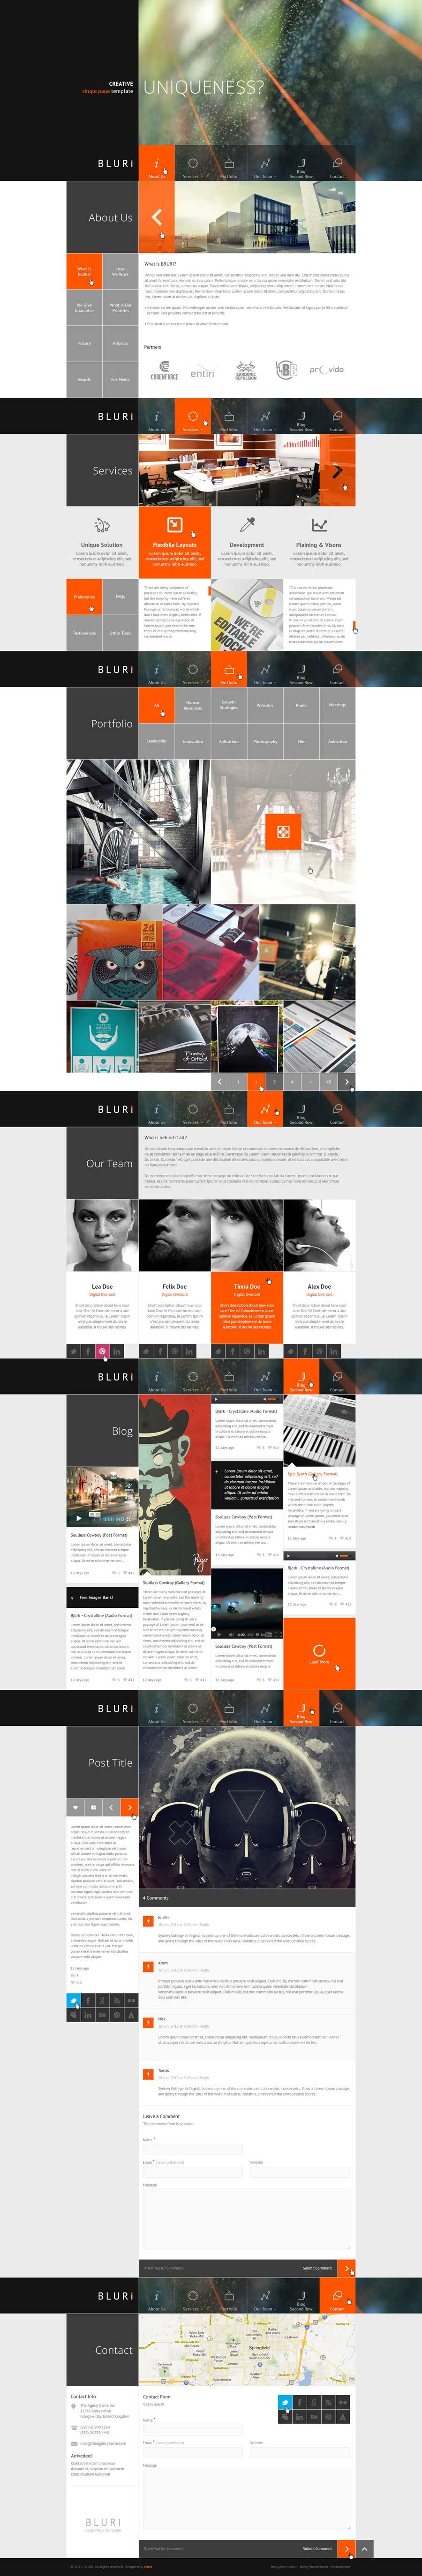 Http Themeforest Net Theme Previews 3882654 Bluri Single Page Template Index 2 Web Design Infografica Grafici